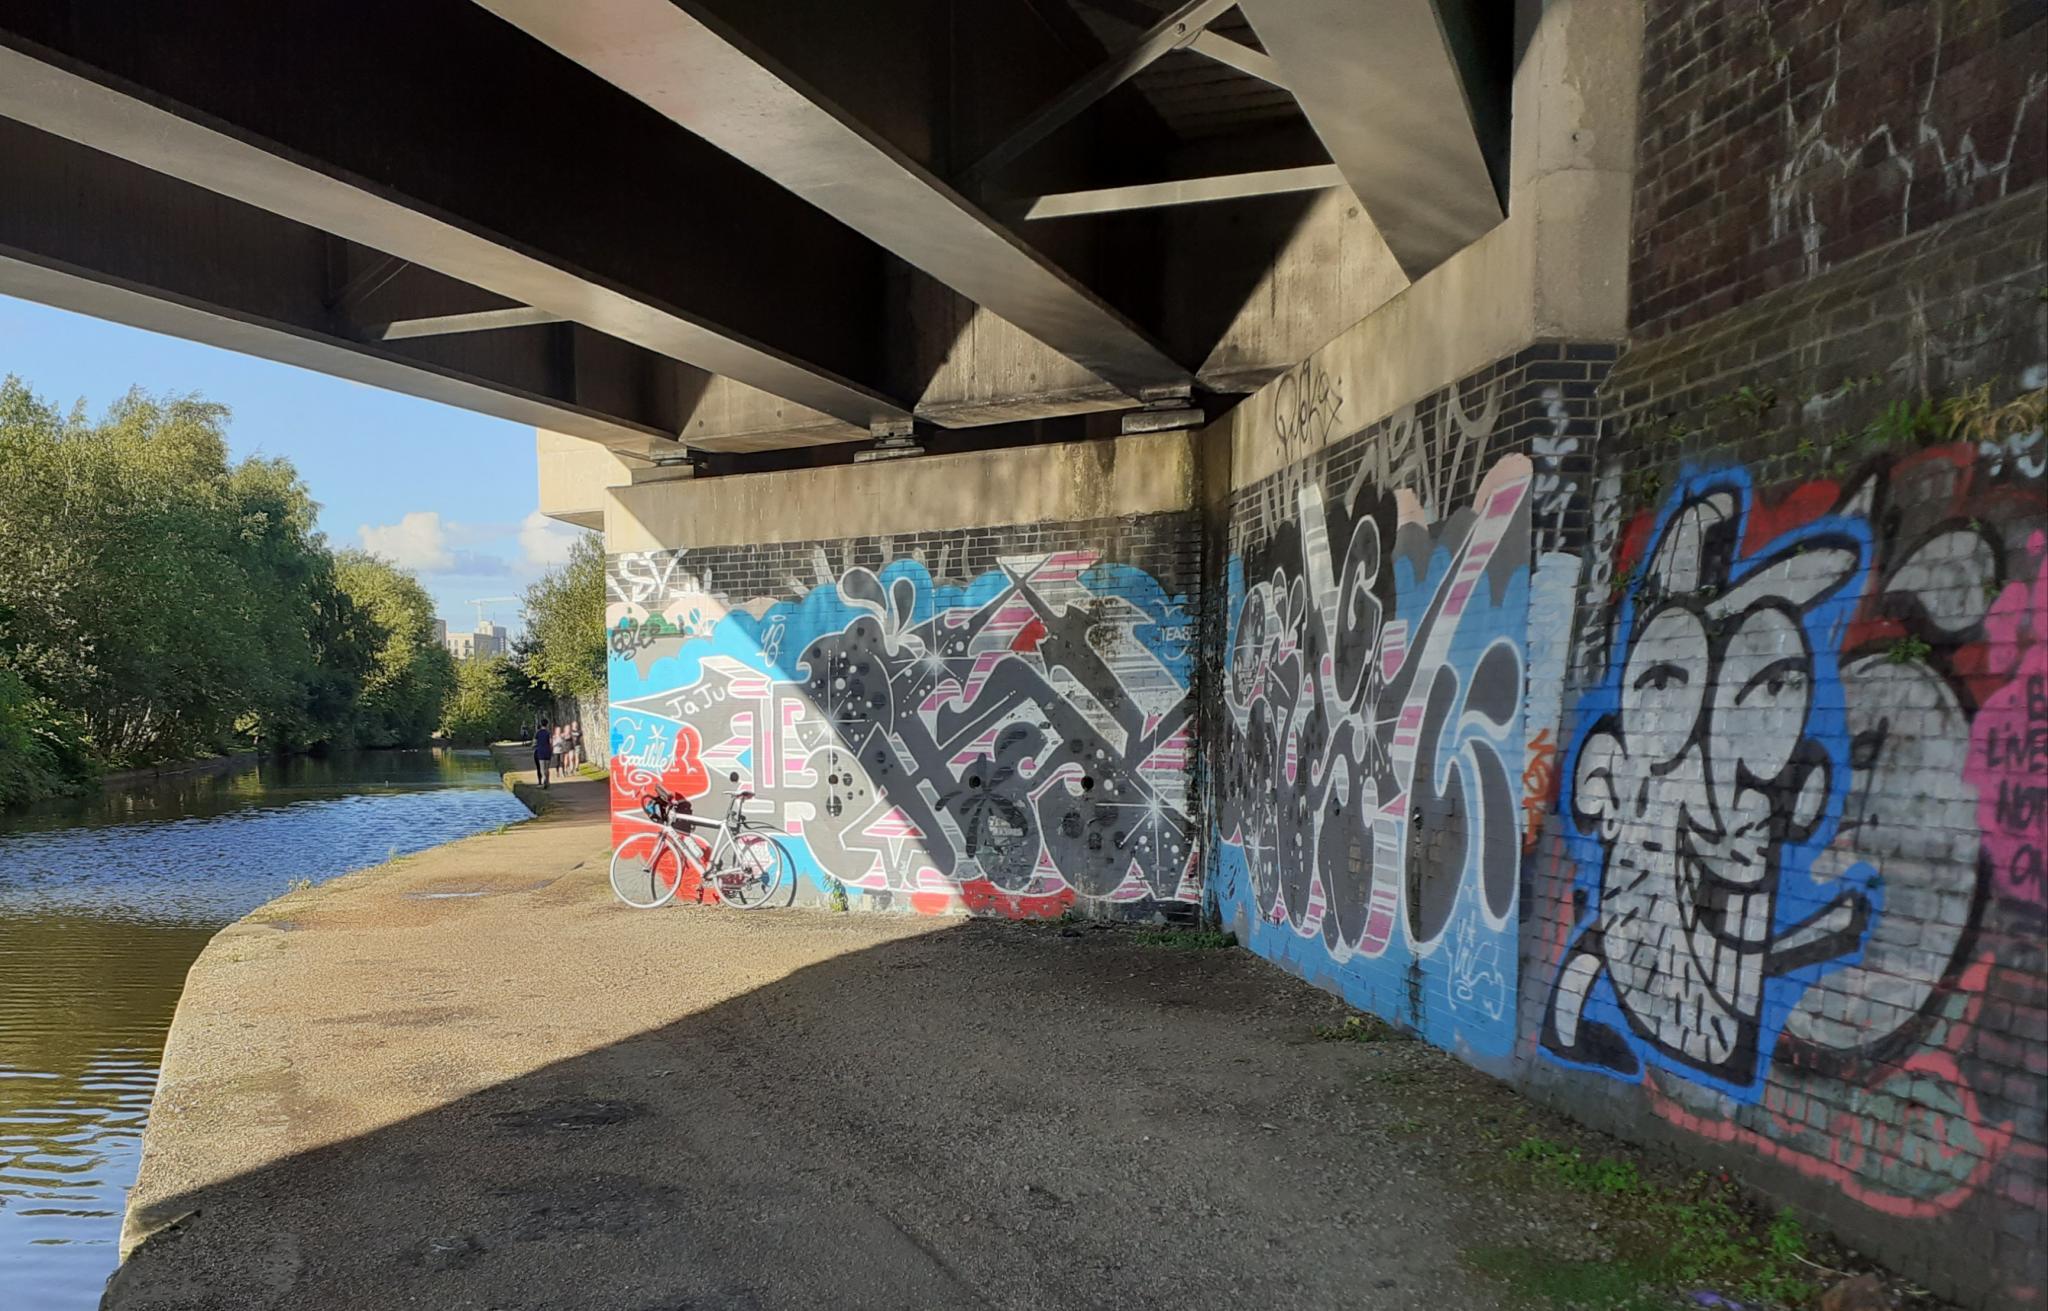 On my bike-20200803_201236-jpg